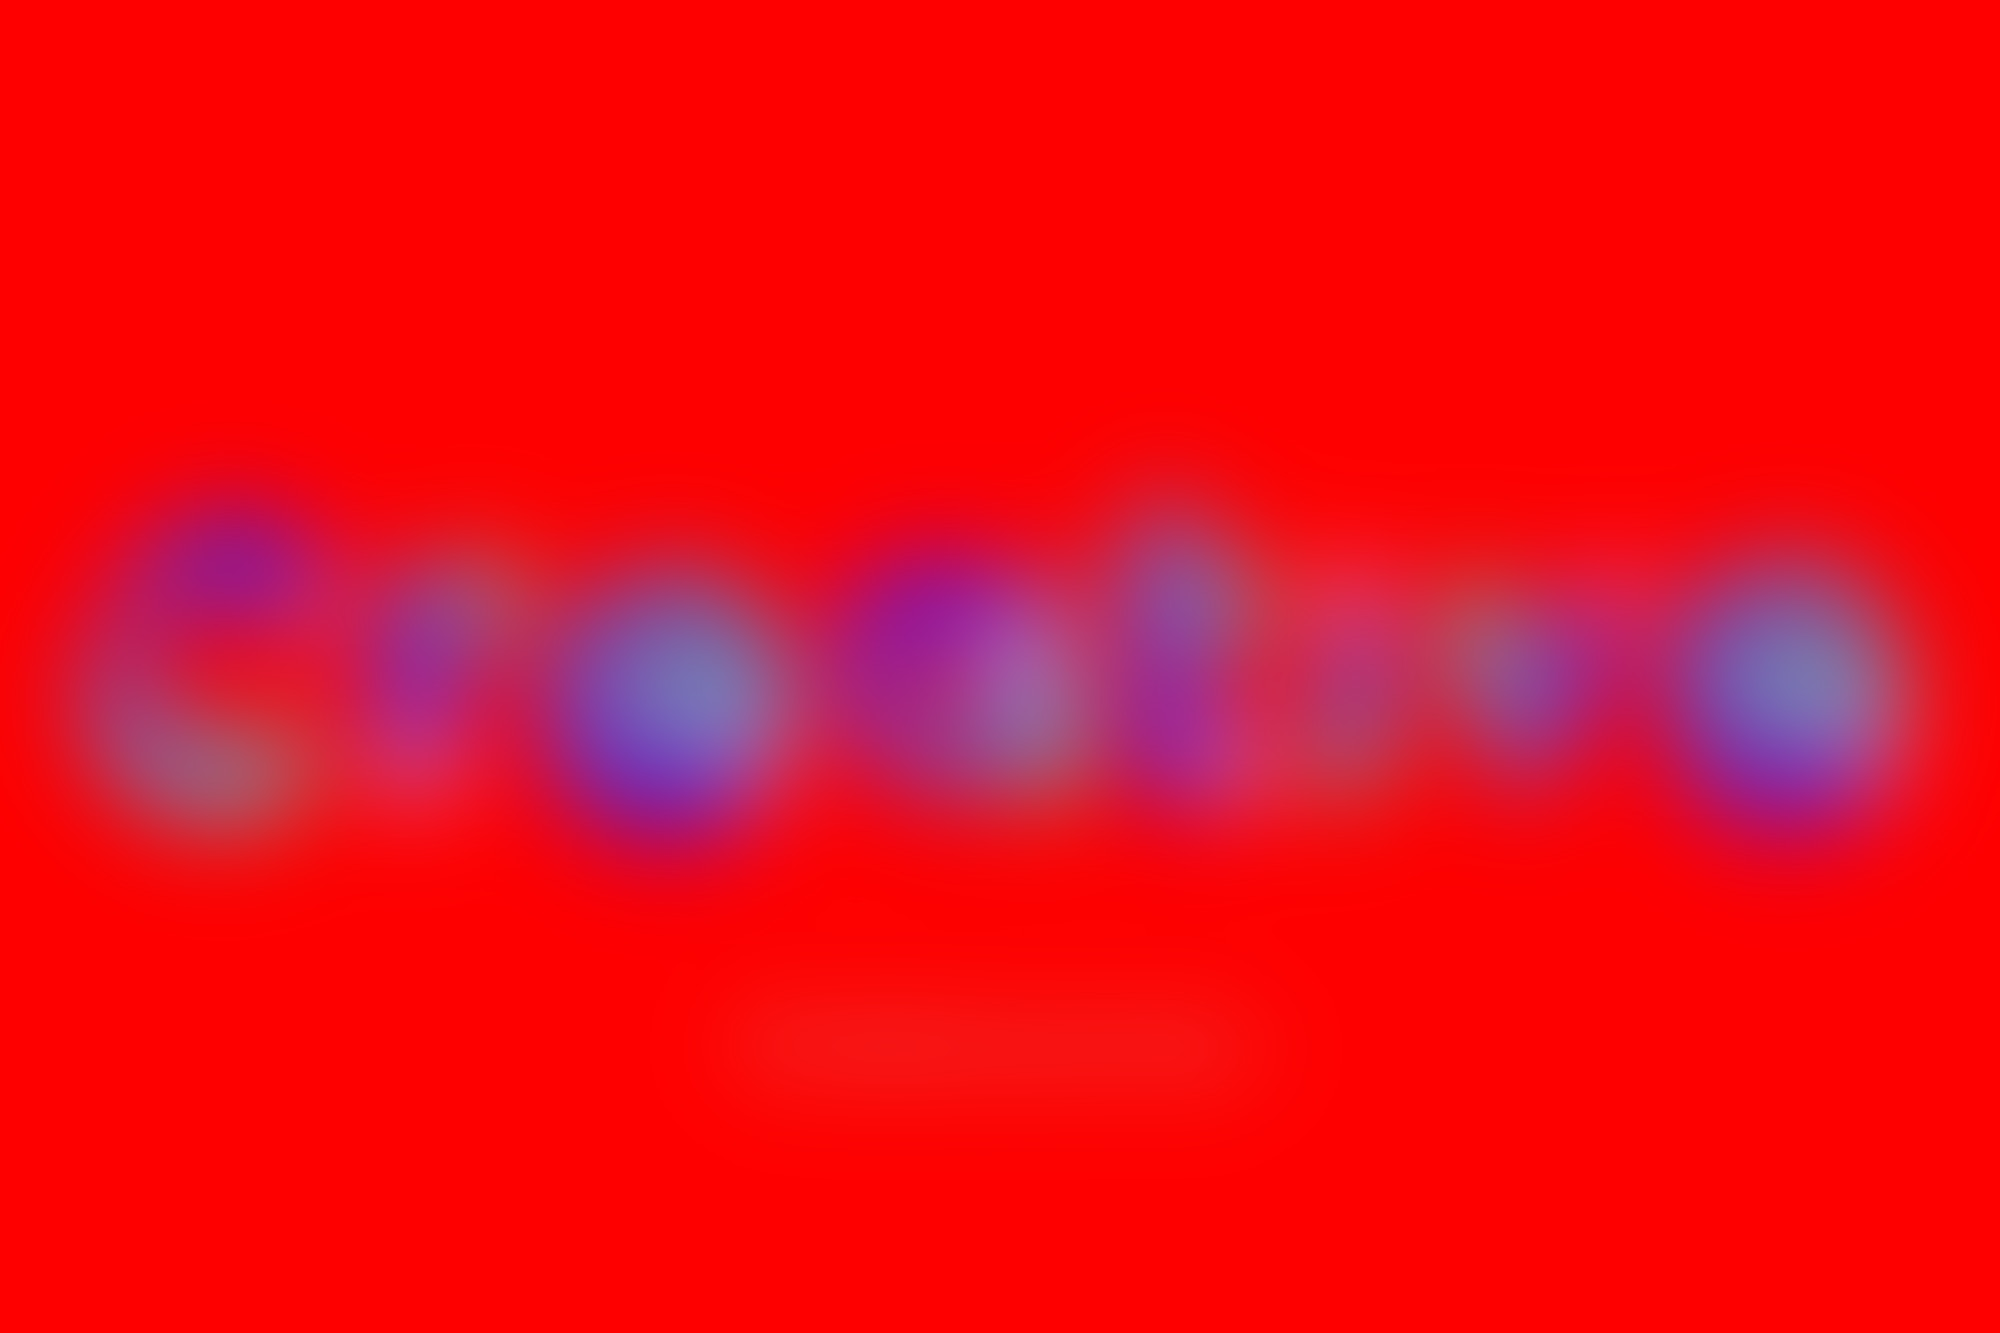 Creative Journey logo 2016 C2 A9 TEMPLO autocompressfitresizeixlibphp 1 1 0max h2000max w3 D2000q80s138bd78ac10e3fac5e0a2923091a2cf9